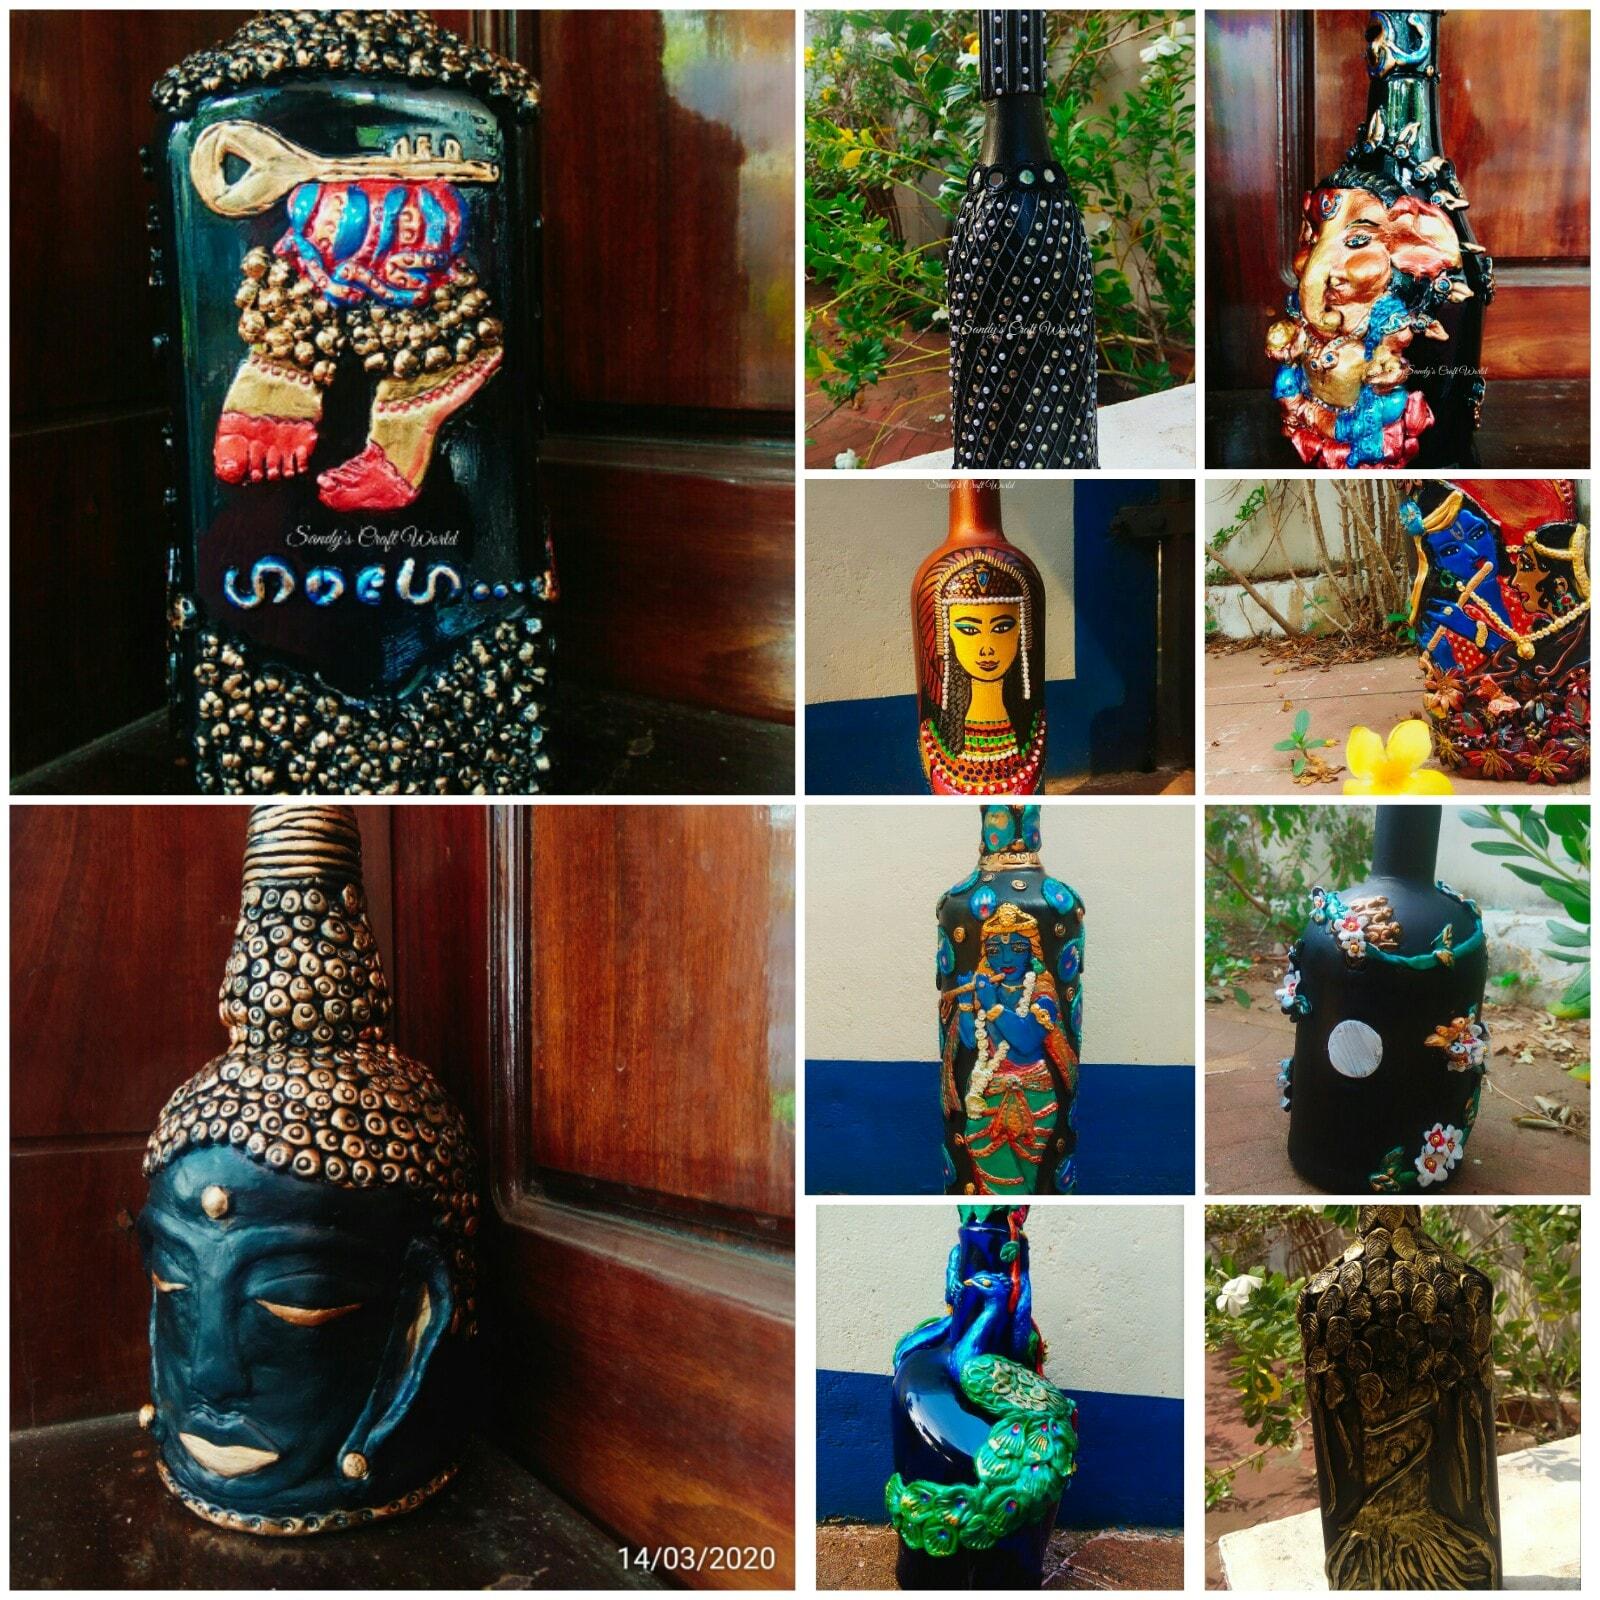 Sandhya Radhakrishnan's botle arts collection